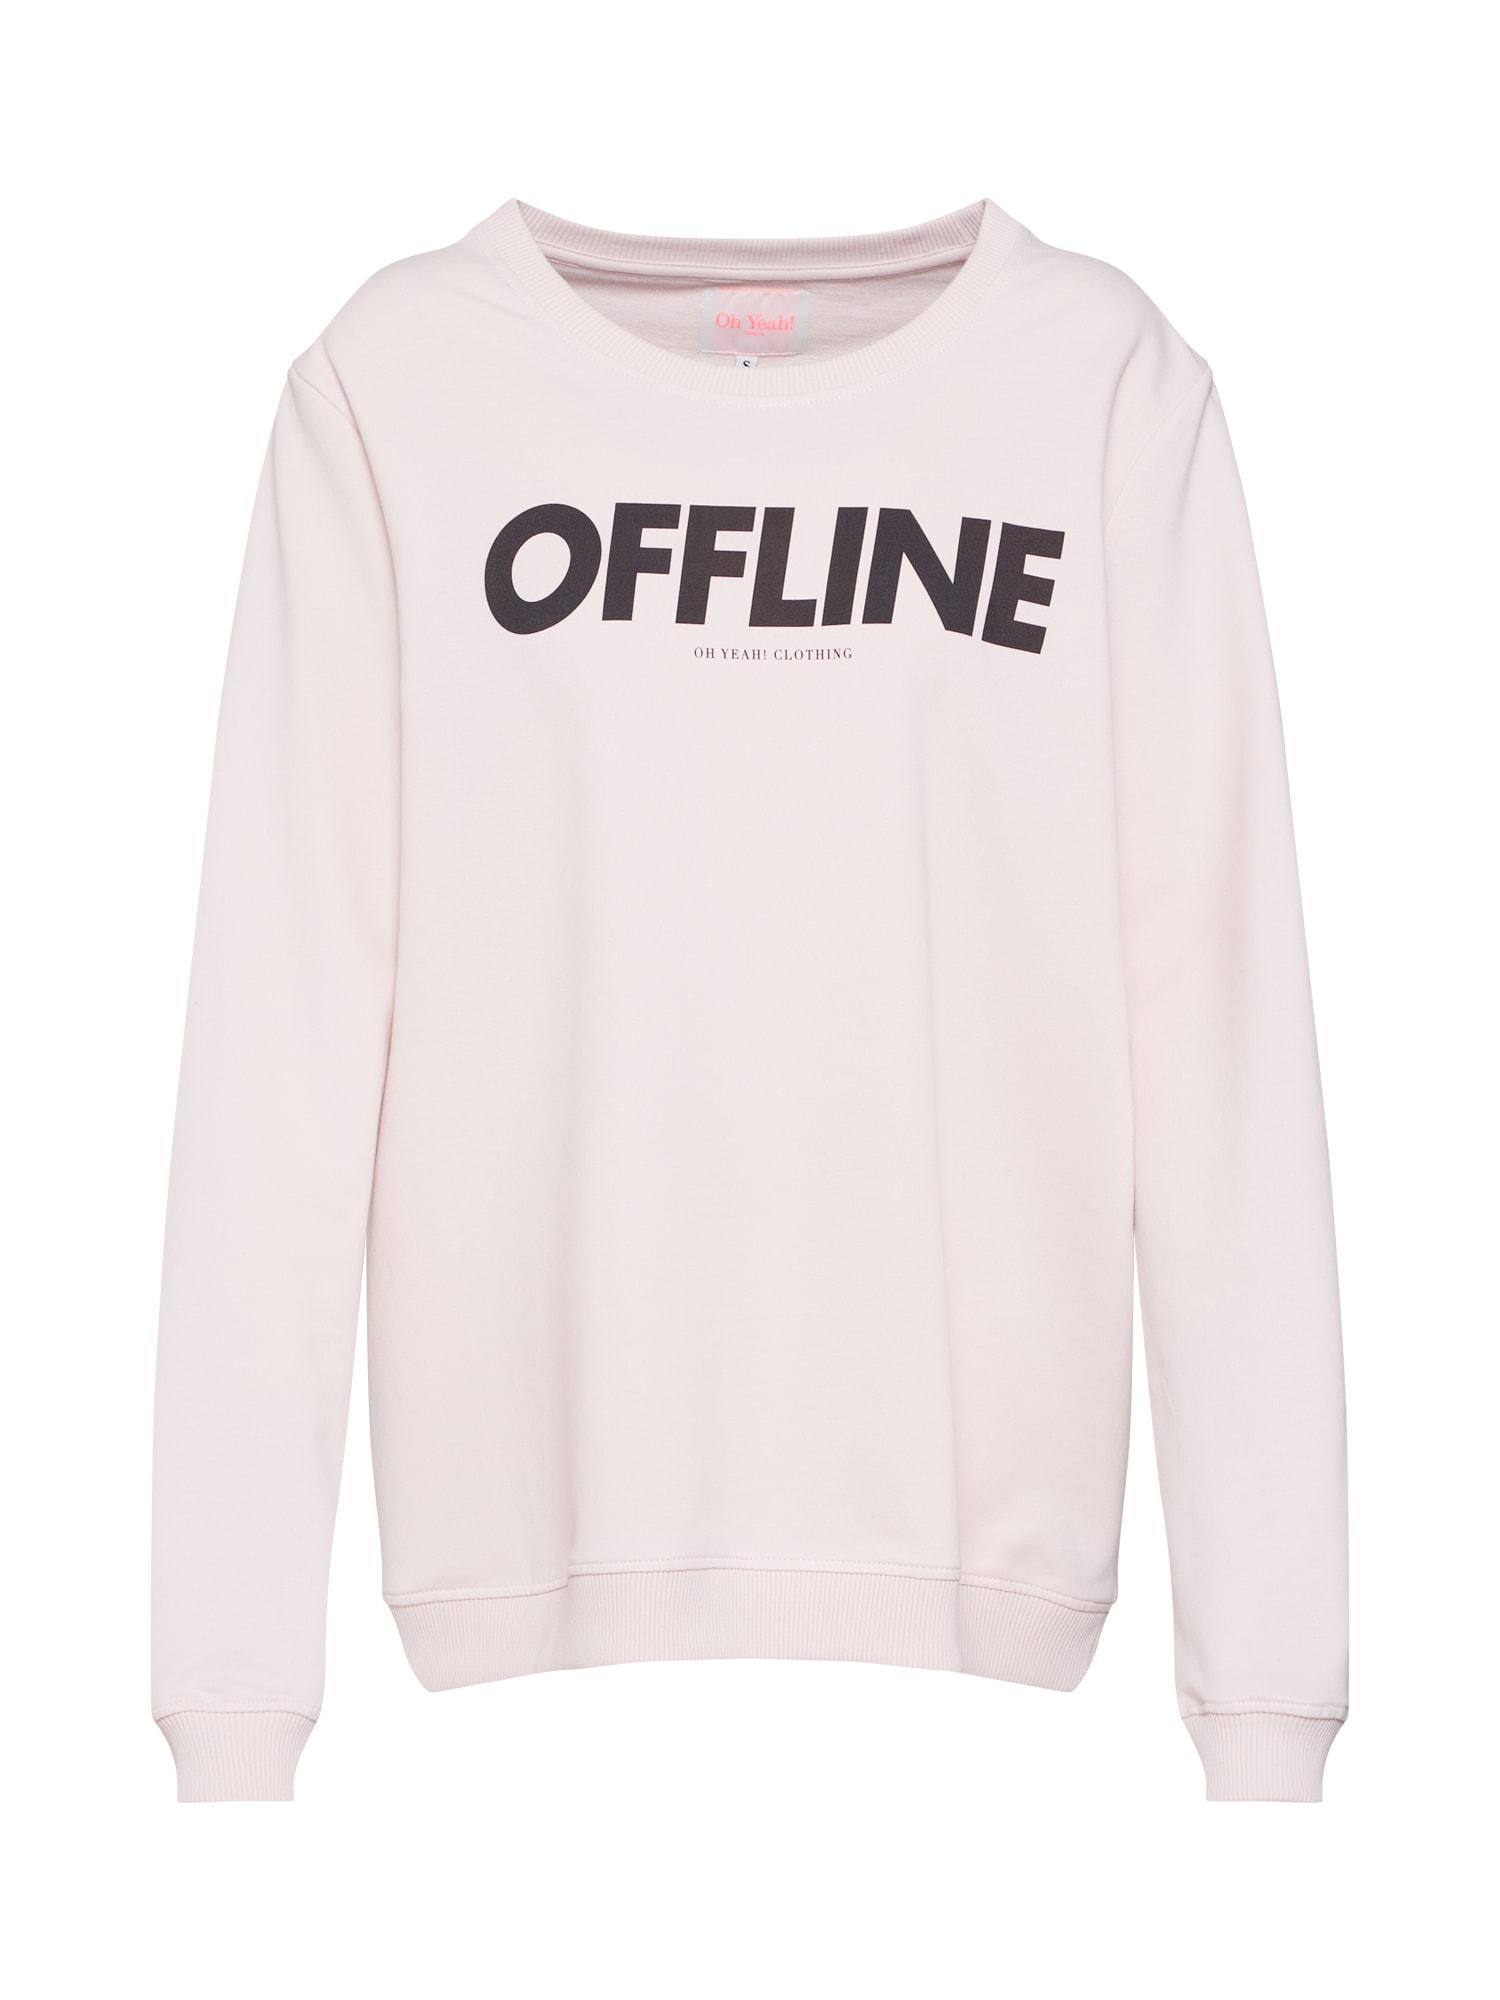 Mikina offline Rosé růžová Oh Yeah!